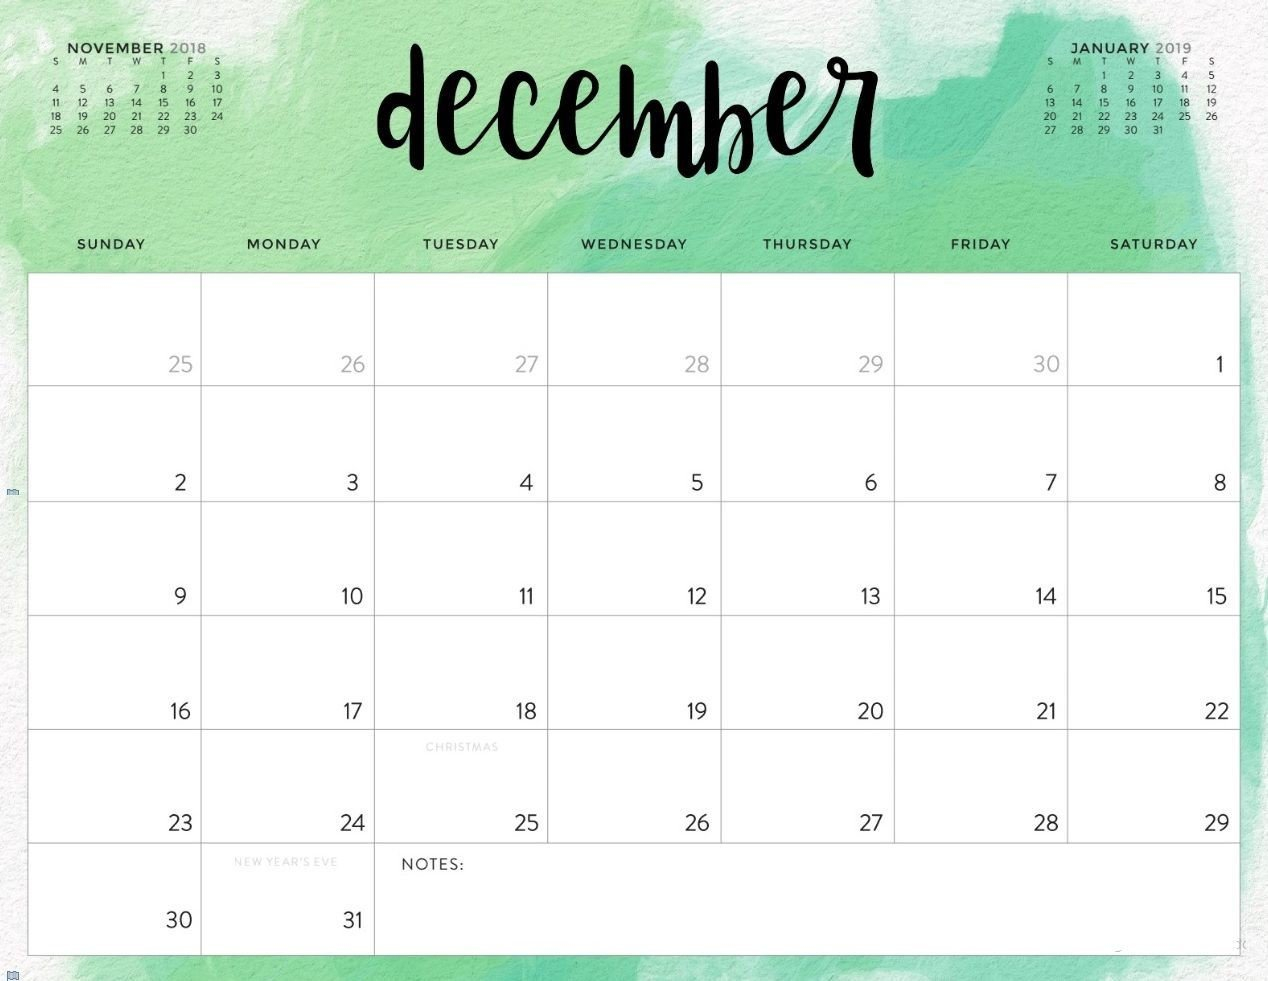 Calendar That I Can Edit :-Free Calendar Template Free Calendar That I Can Edit